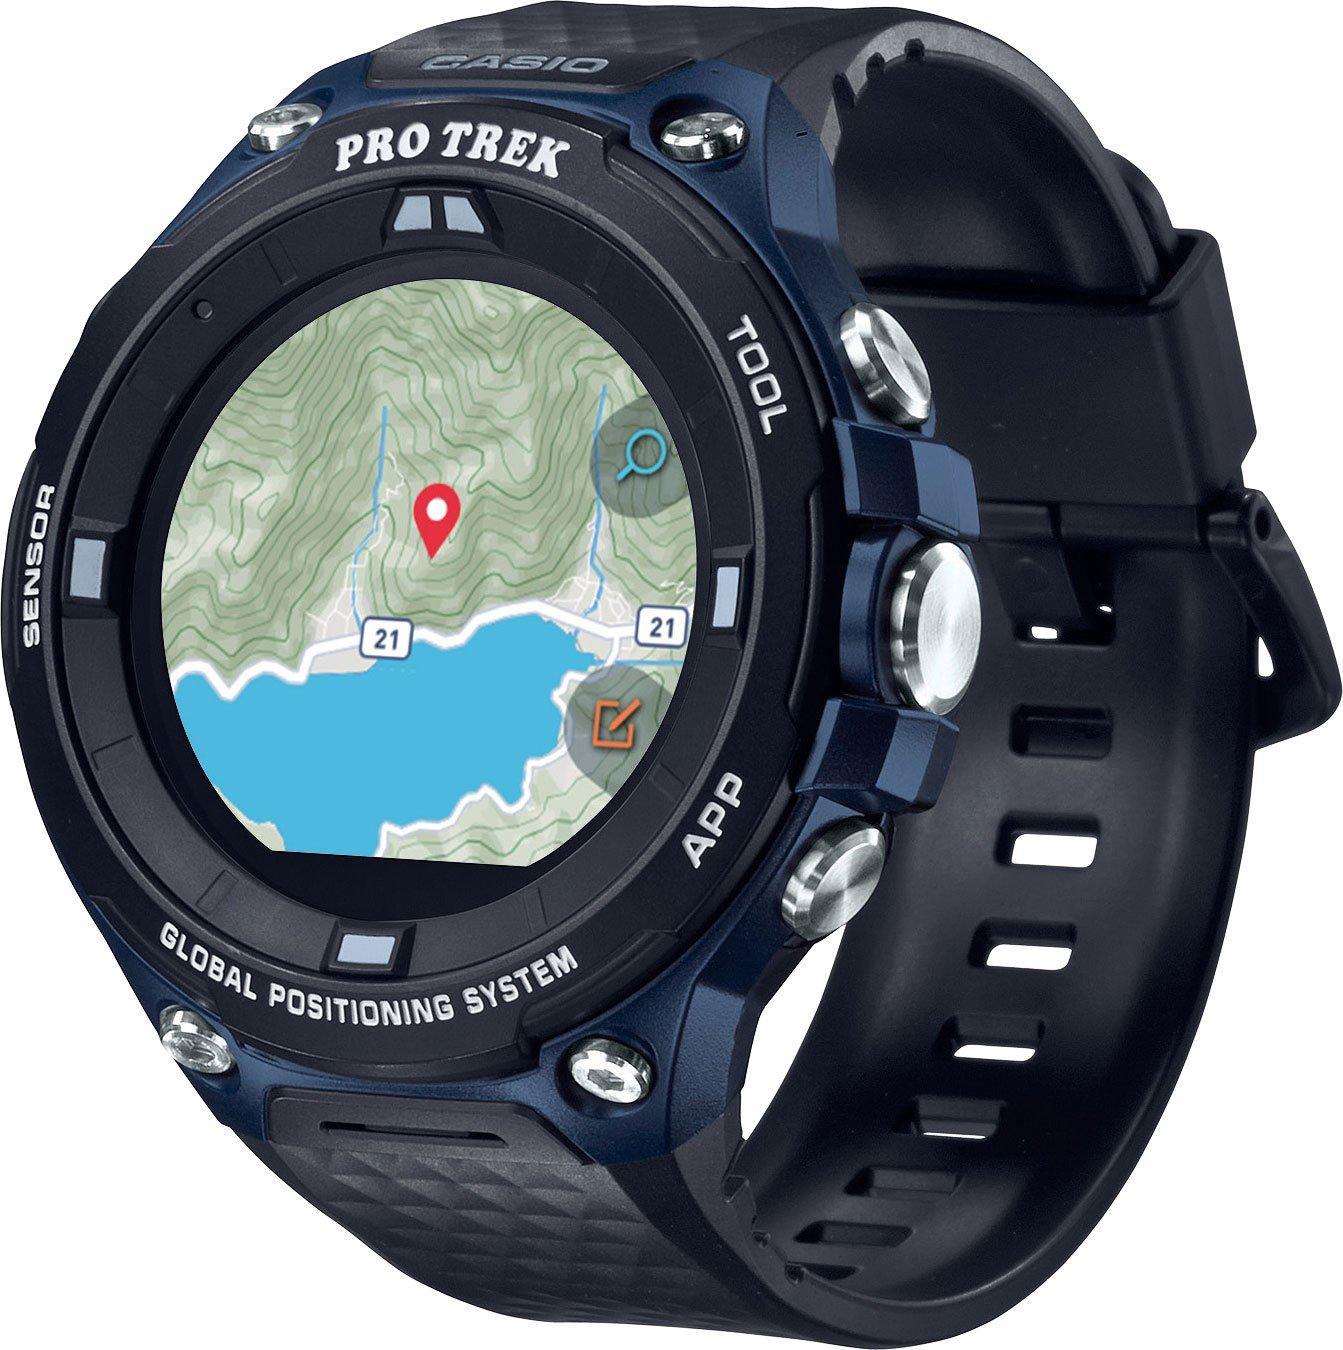 Casio WSD-F20 Pro Trek Smartwatch, F20A/F20A